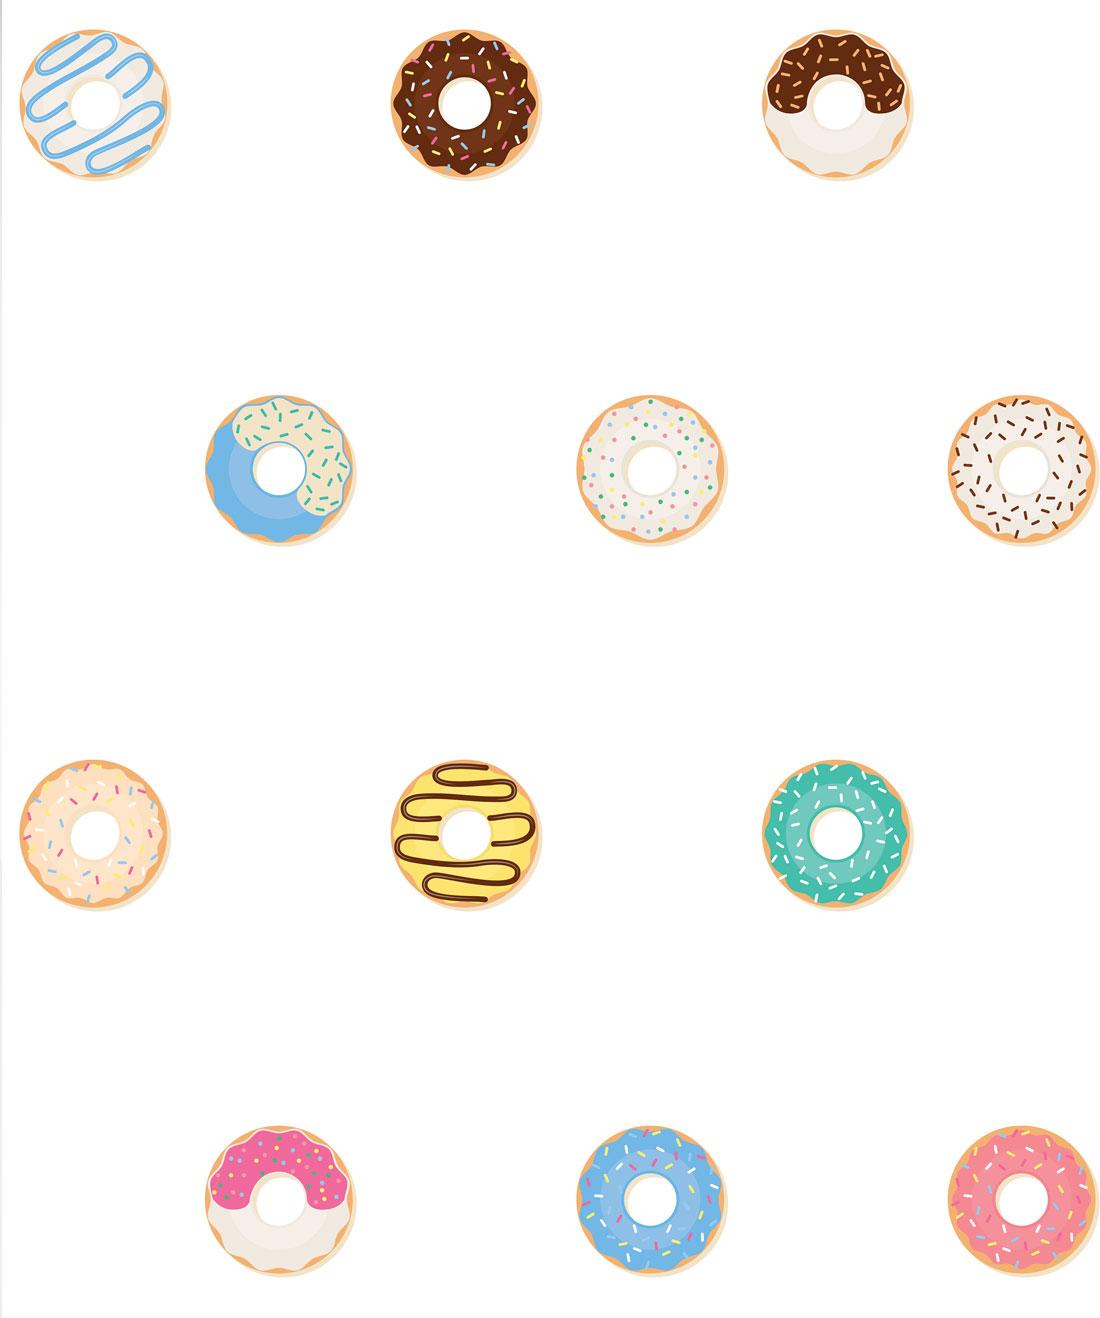 Doughnuts Wallpaper